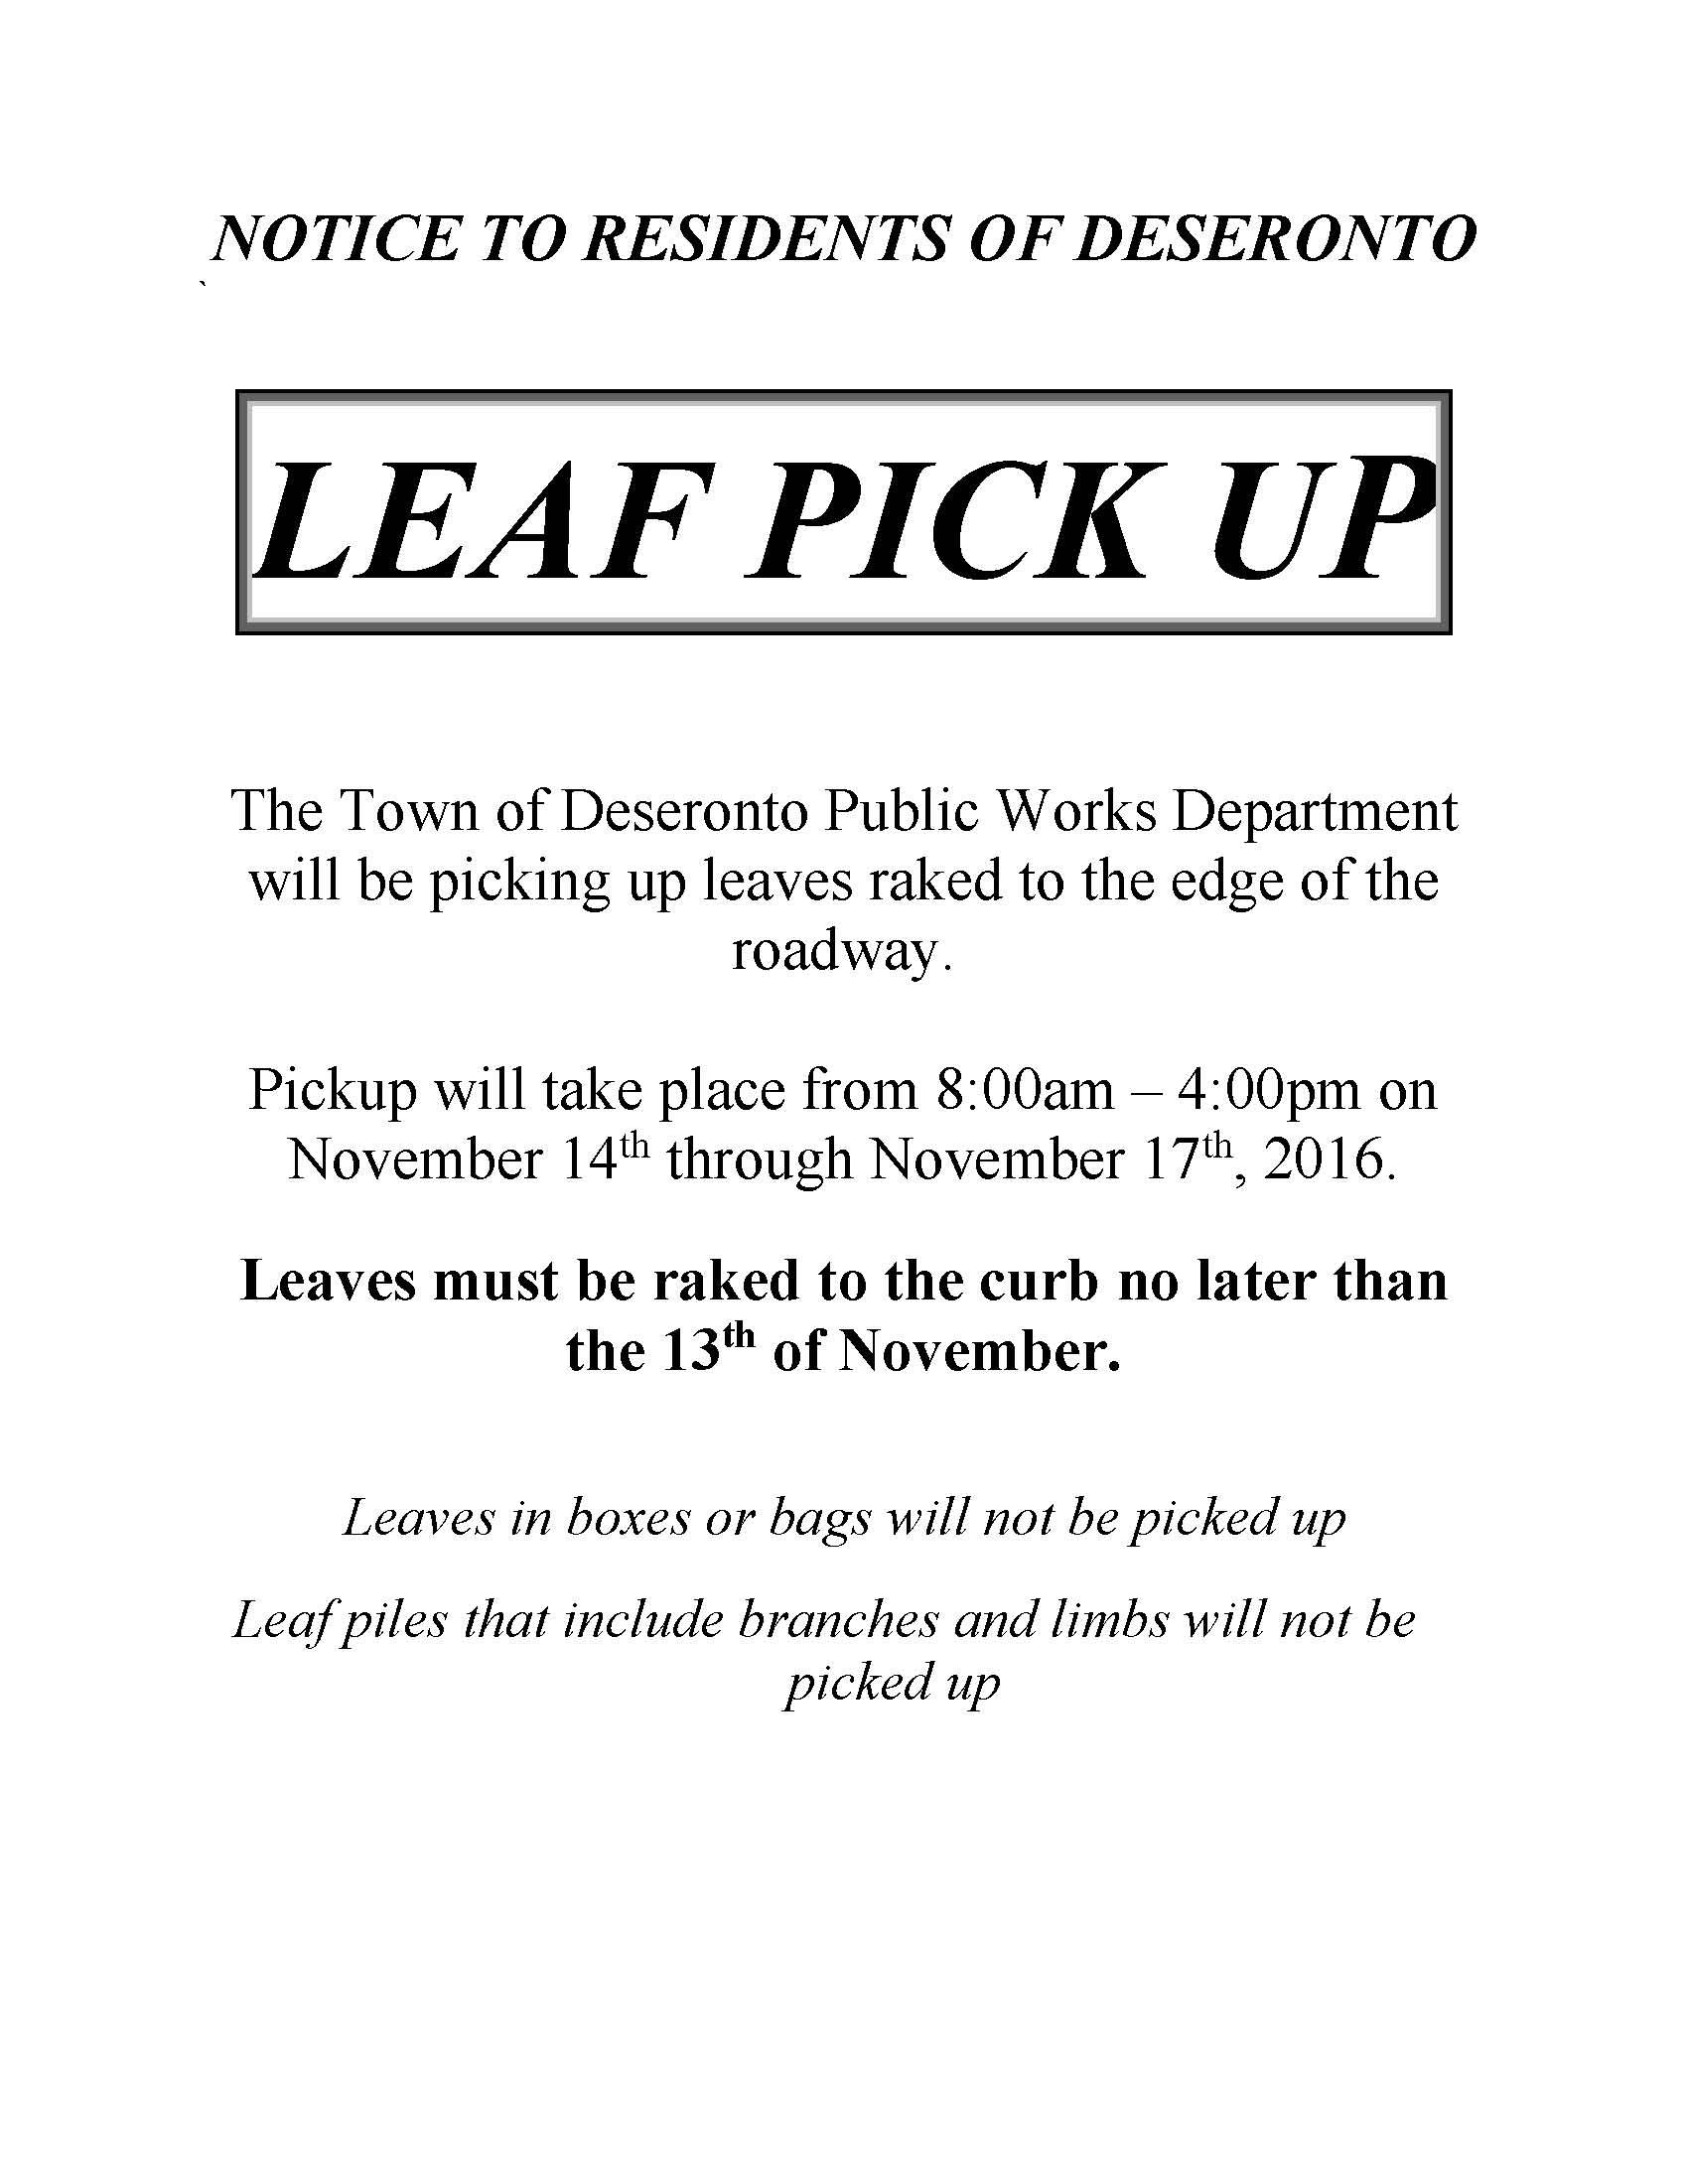 Leaf Pick Up